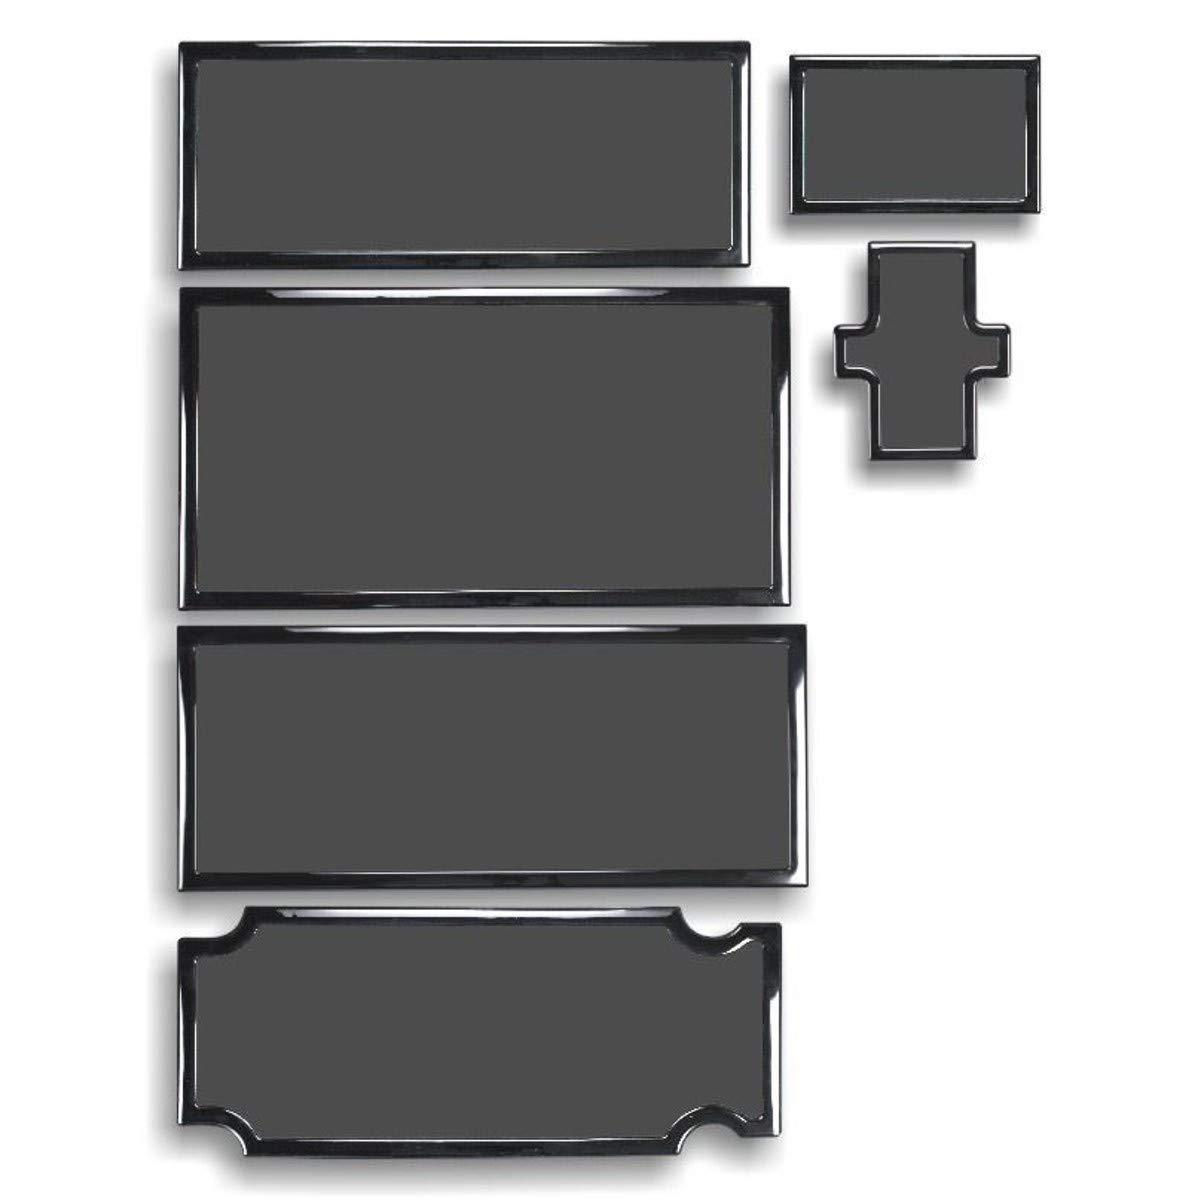 DEMCiflex Dust Filter Kit for Thermaltake Core X71, Black Frame/Black Mesh by DEMCiflex